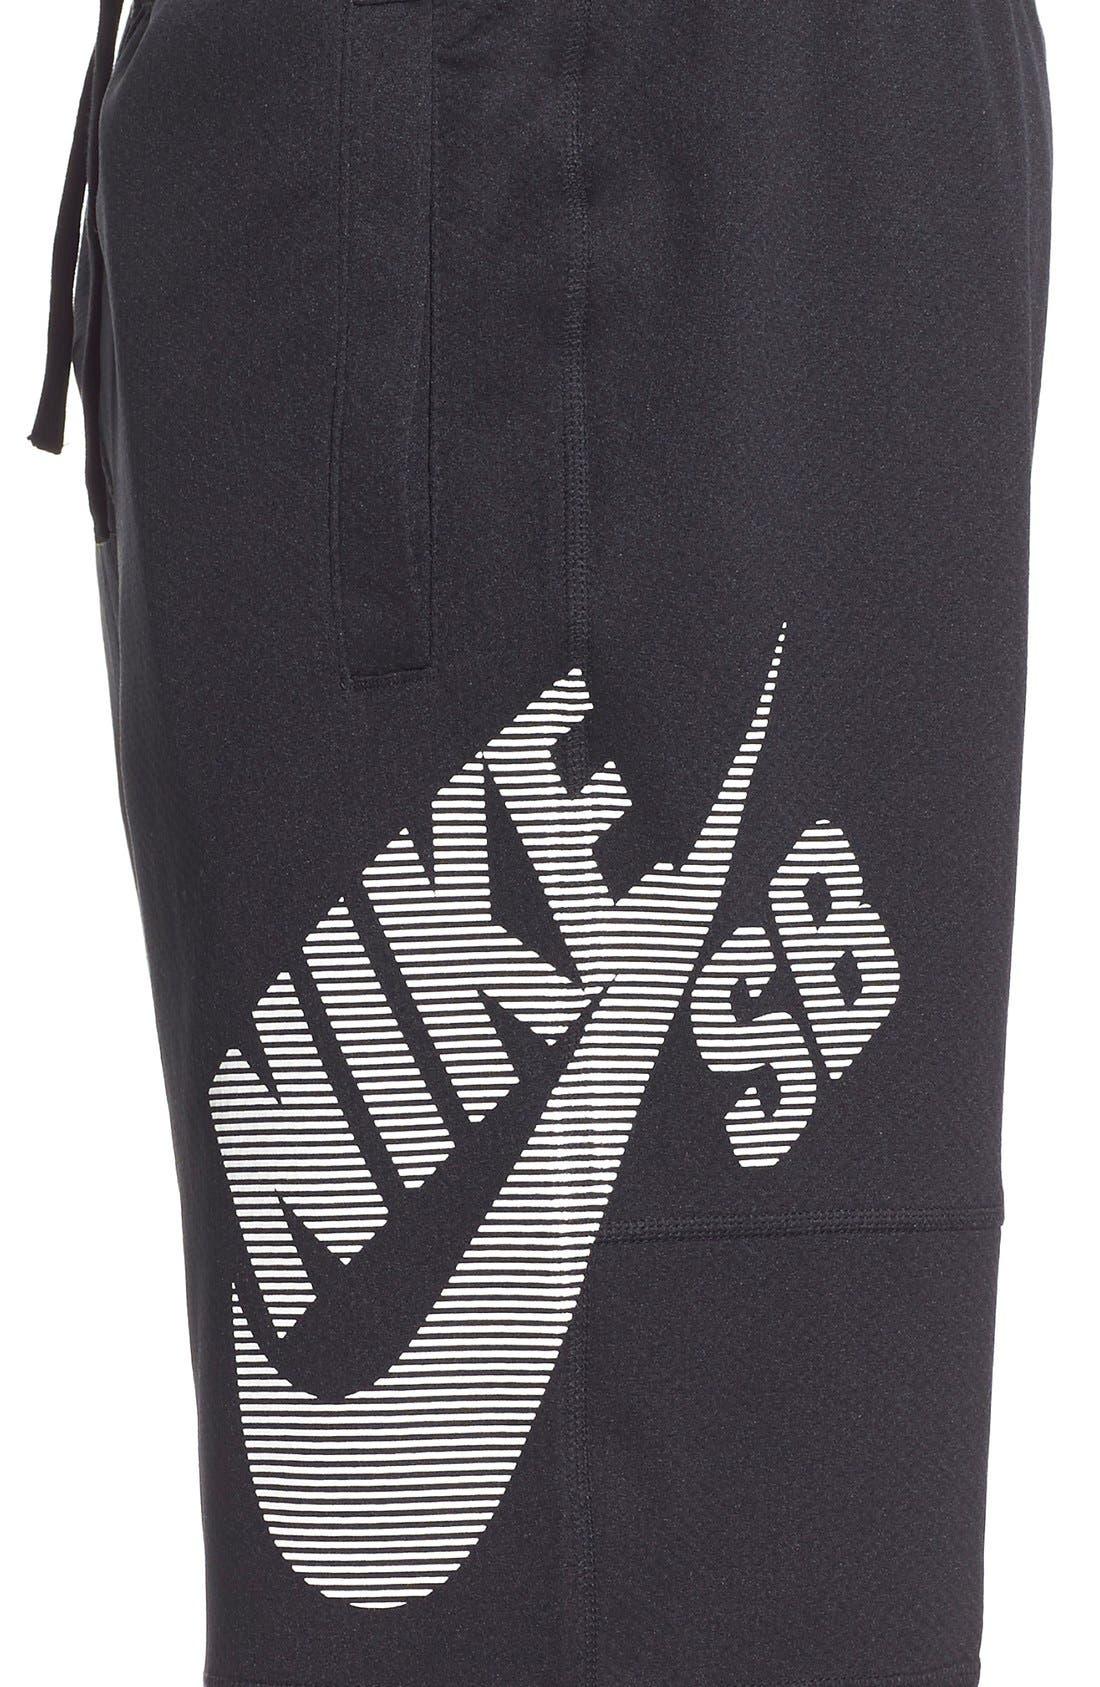 Alternate Image 4  - Nike SB 'Stripe Sunday' Dri-FIT Shorts